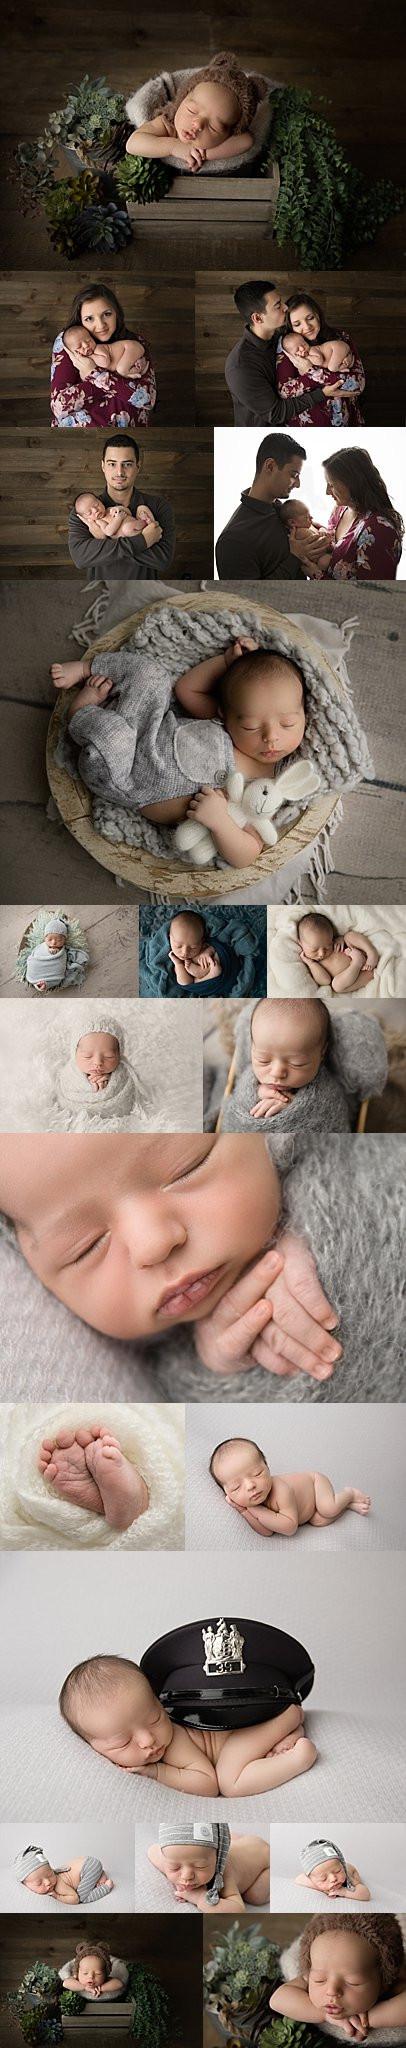 New Jersey newborn photographer photographer